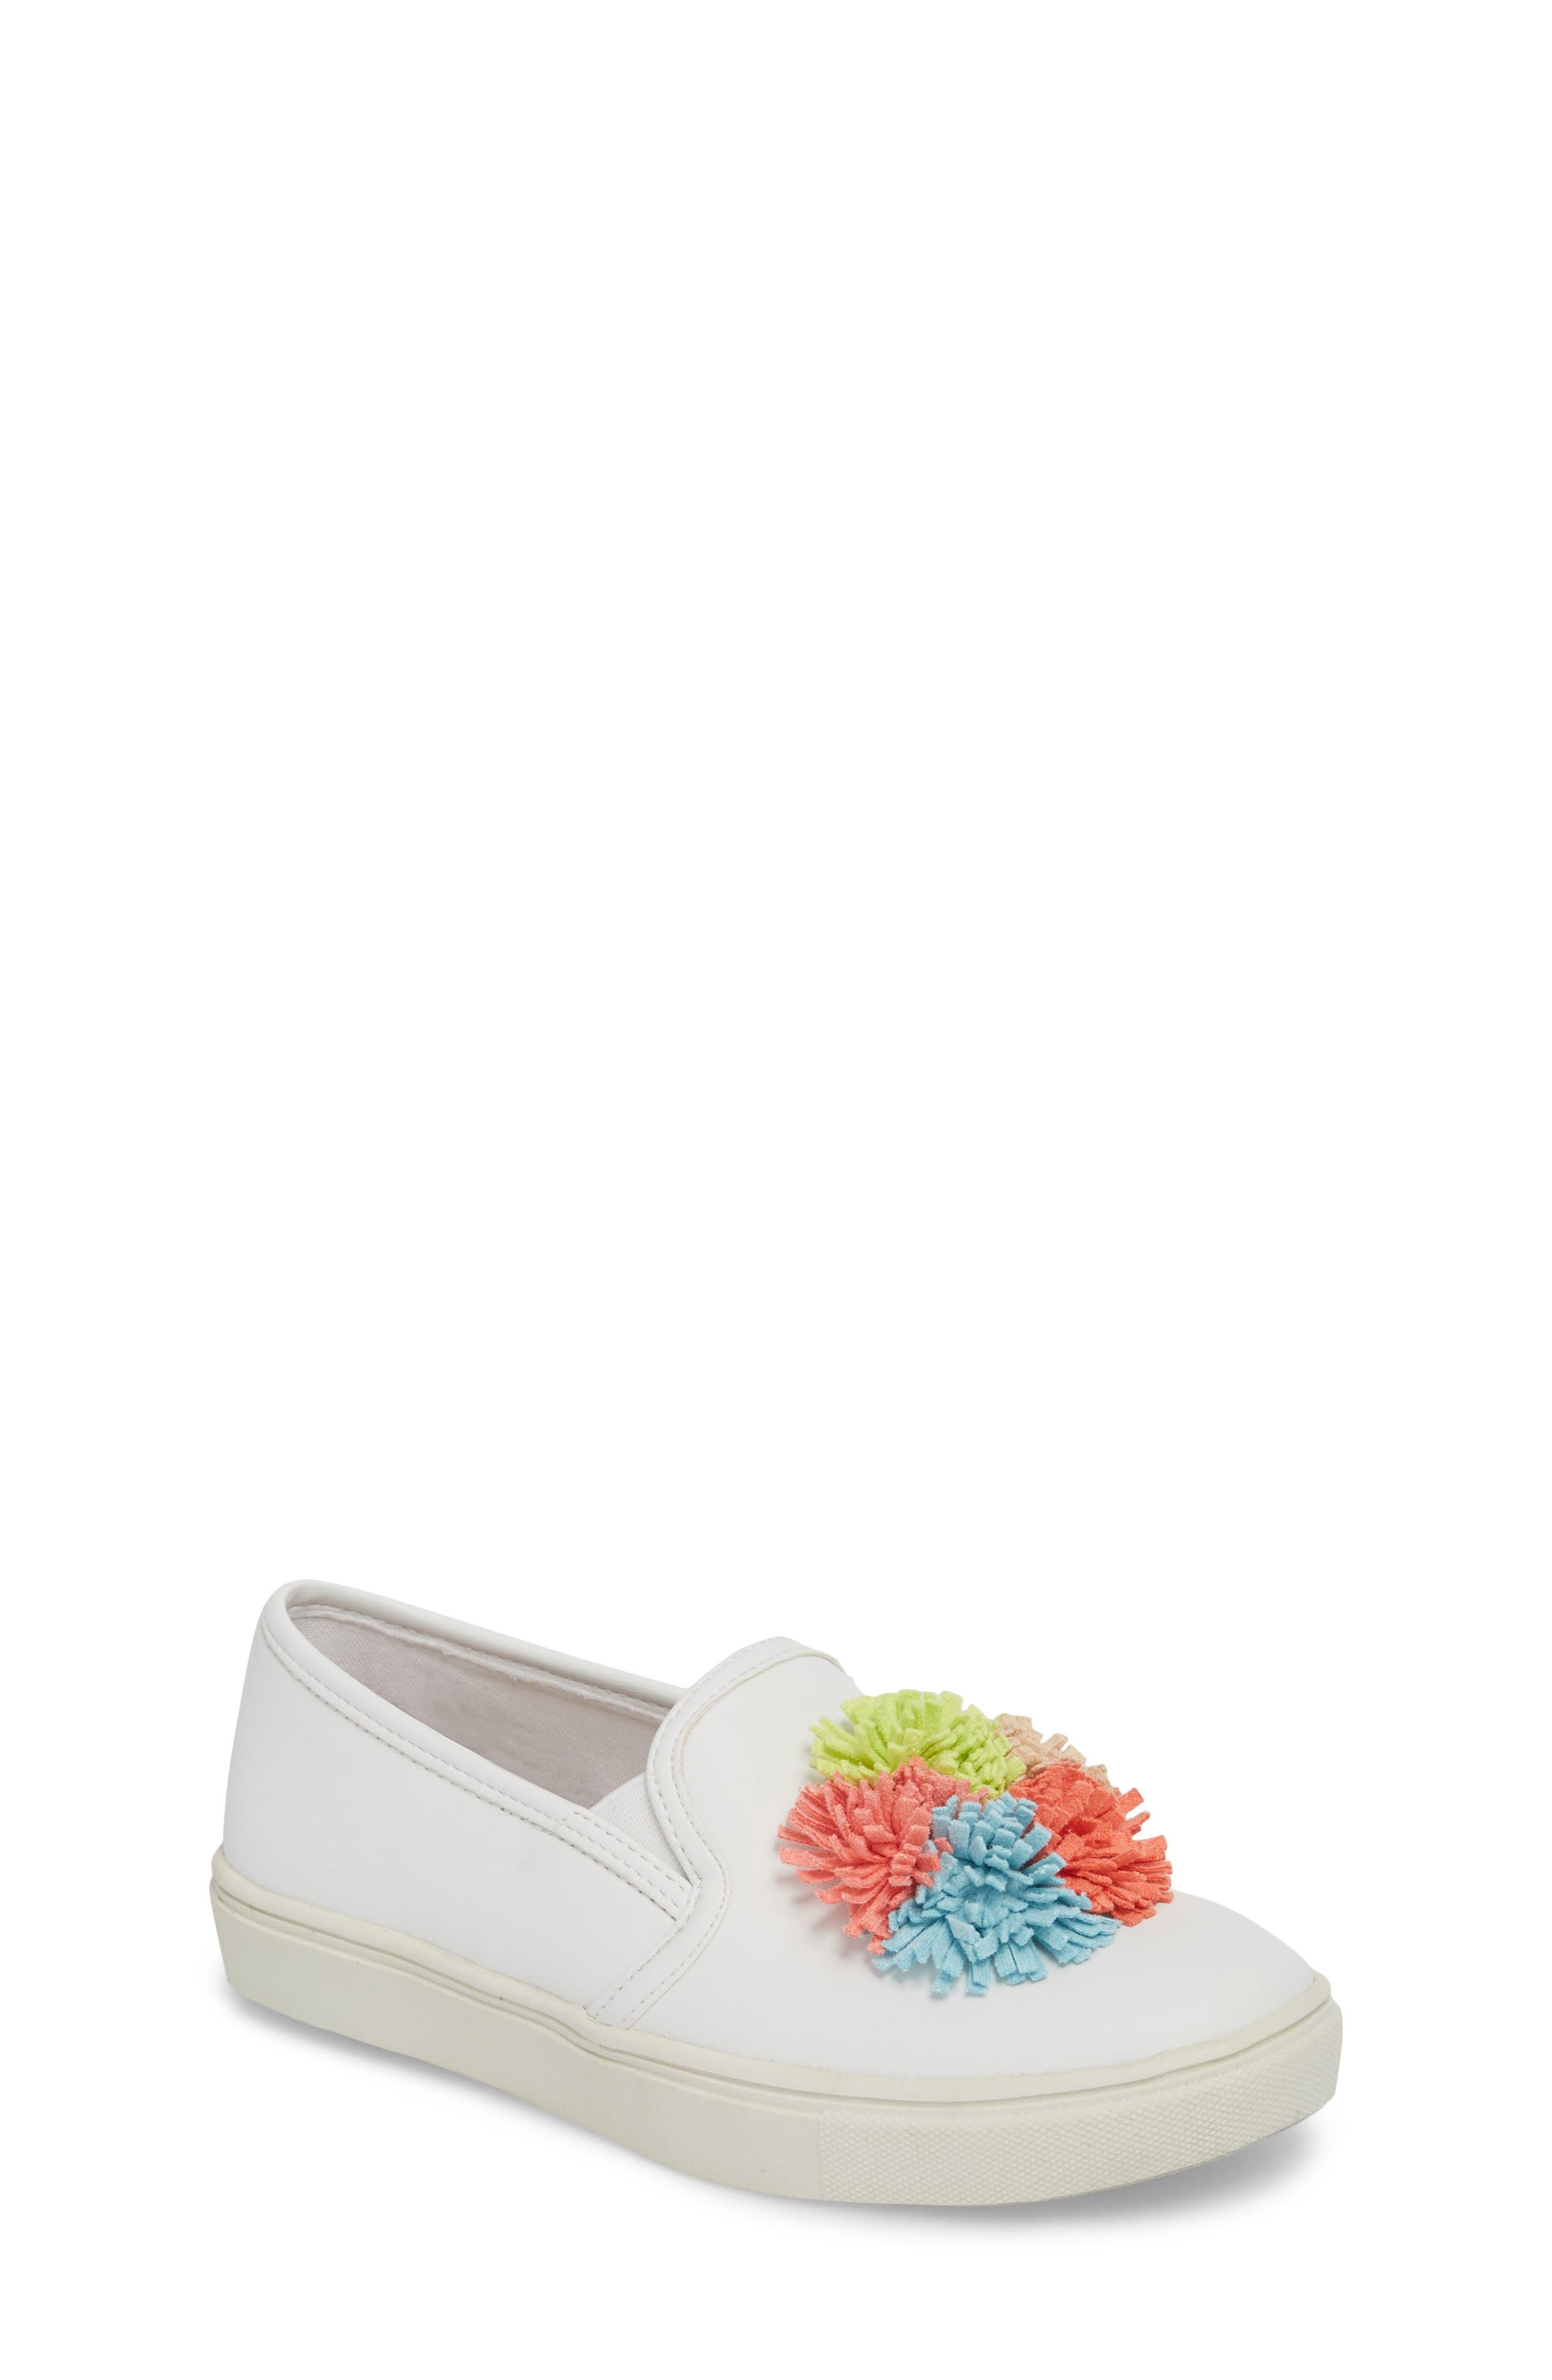 Twiny Pompom Slip-On Sneaker,                             Main thumbnail 1, color,                             100